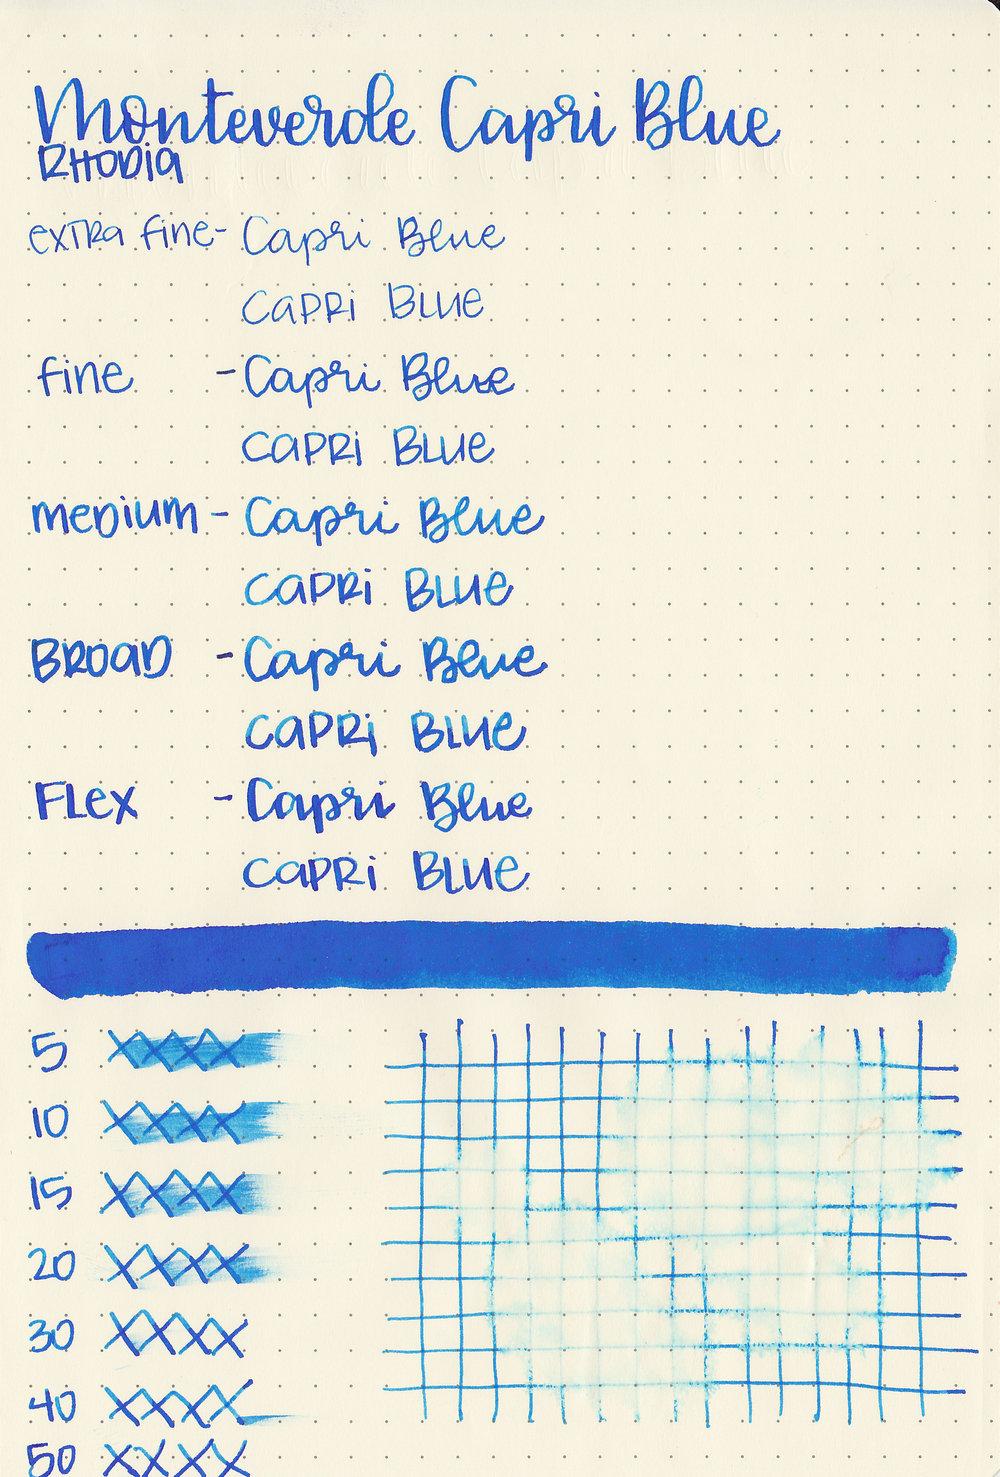 mv-capri-blue-6.jpg